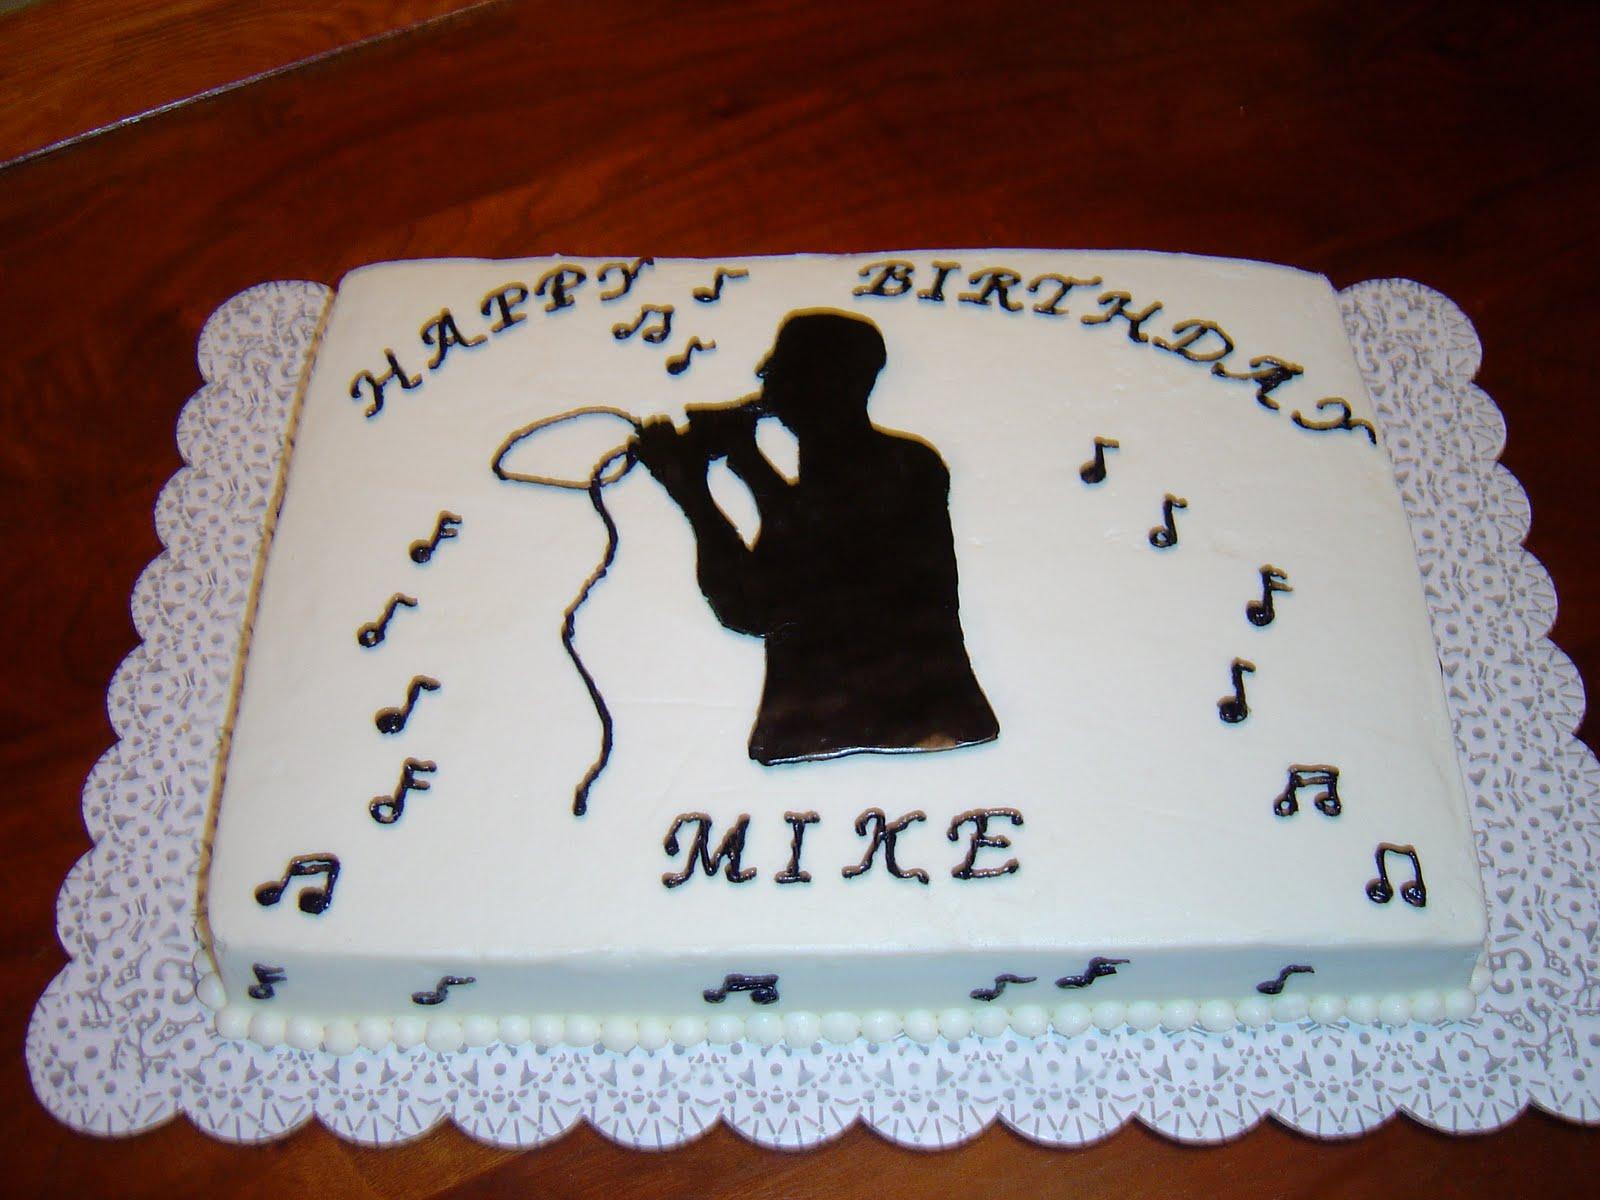 Cake Design For Singer : Sweet T s Cake Design: Karaoke Singer Sheetcake